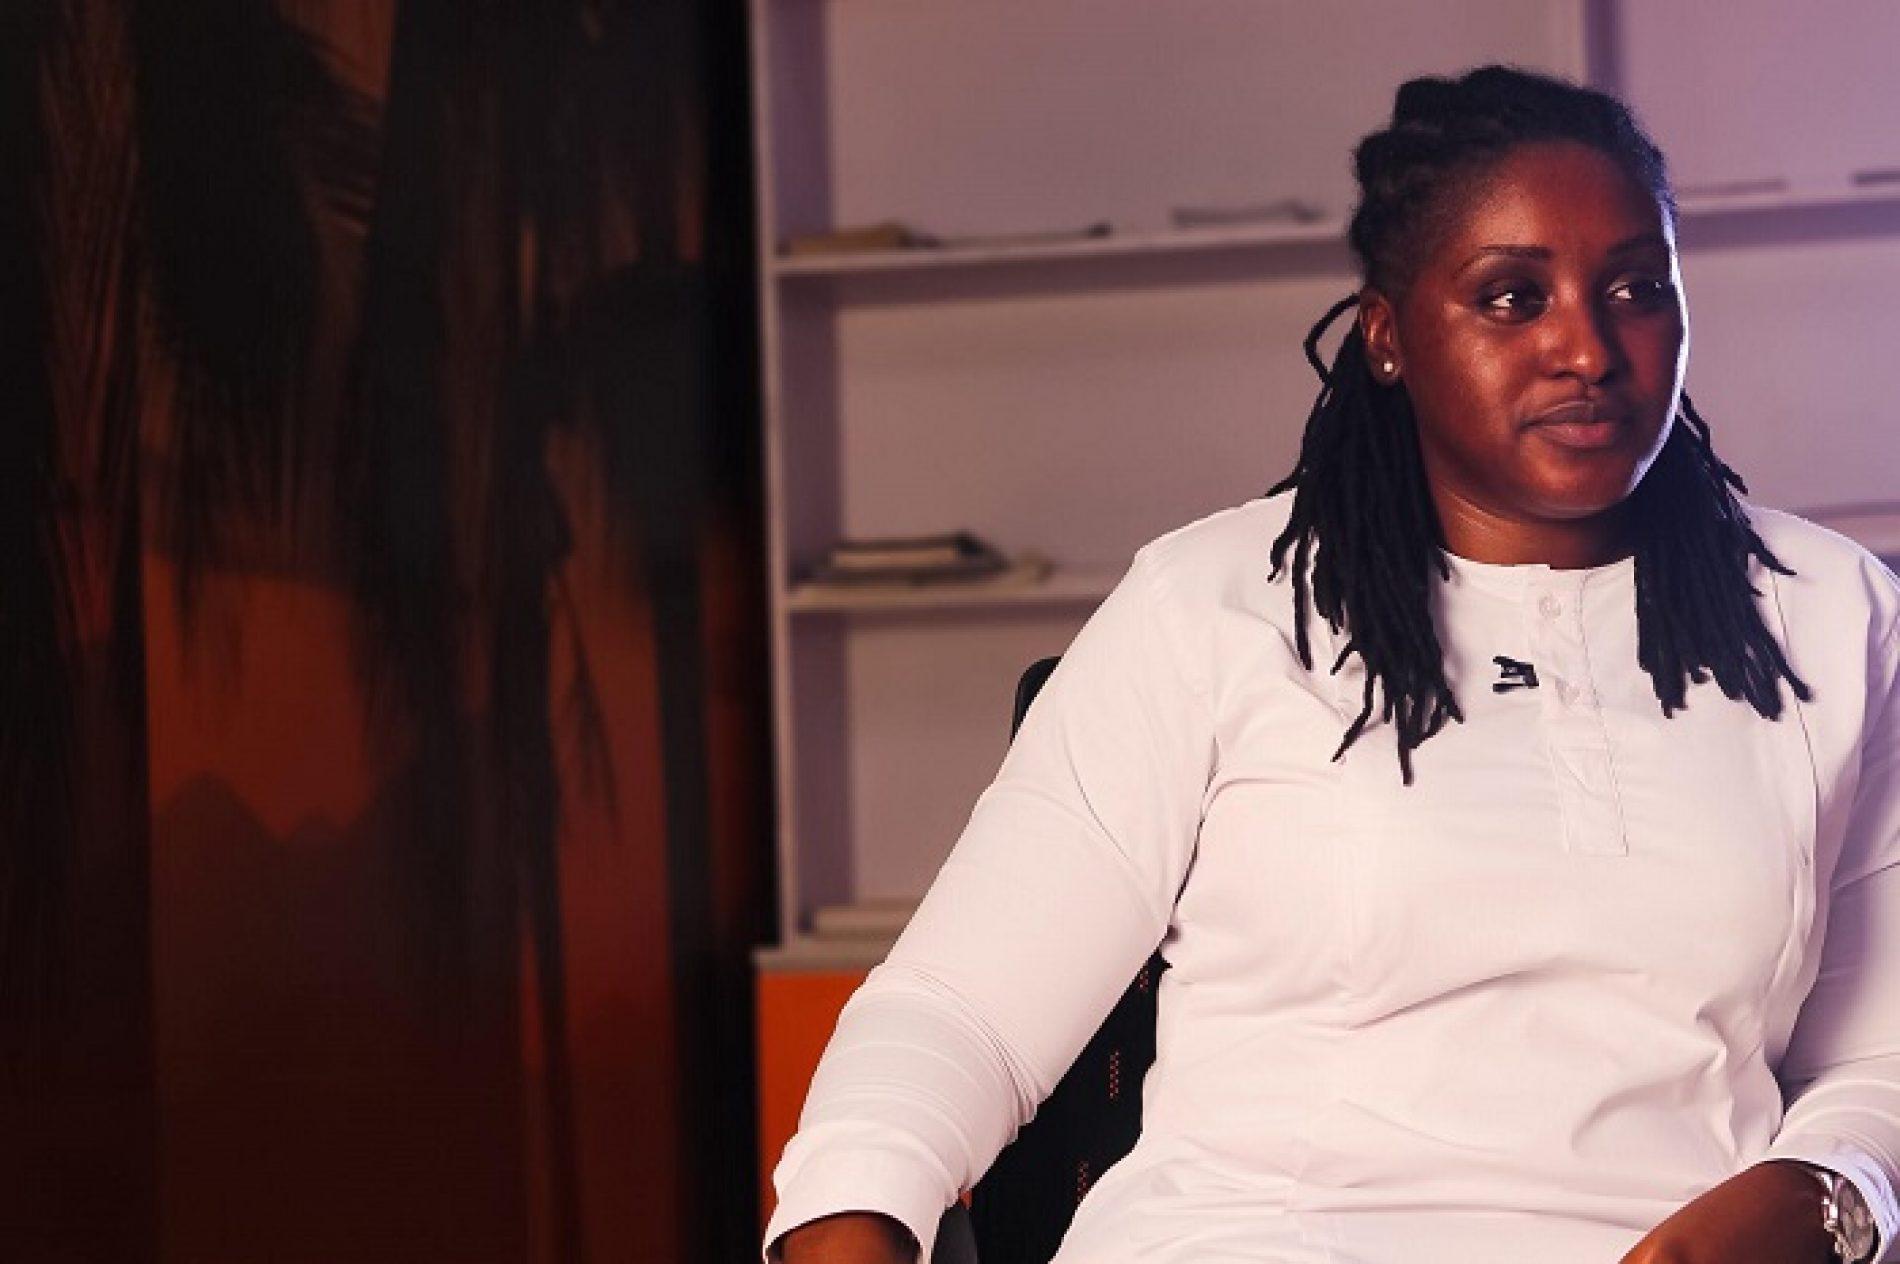 Pamela Adie Is Set To Release New LGBT Documentary 'Under The Rainbow' In Nigeria